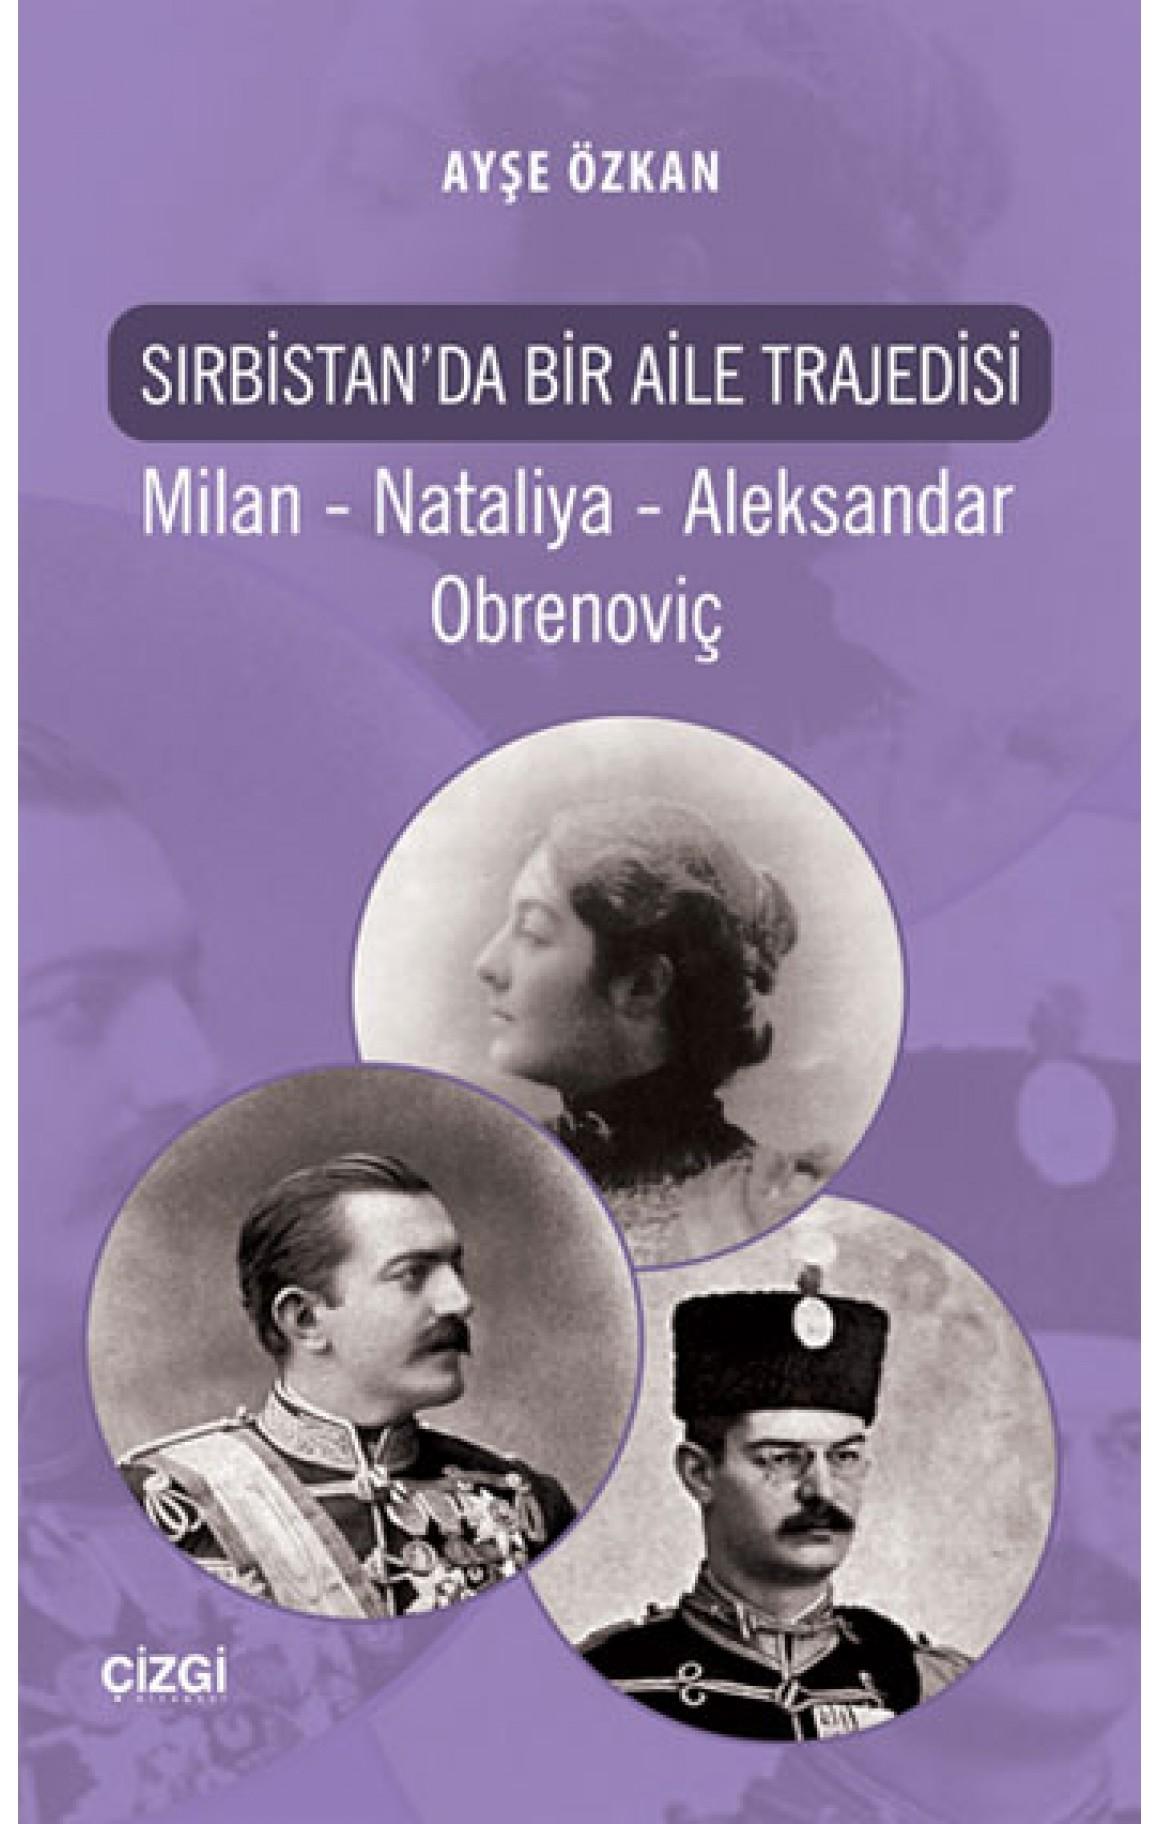 Sırbistanda Bir Aile Trajedisi